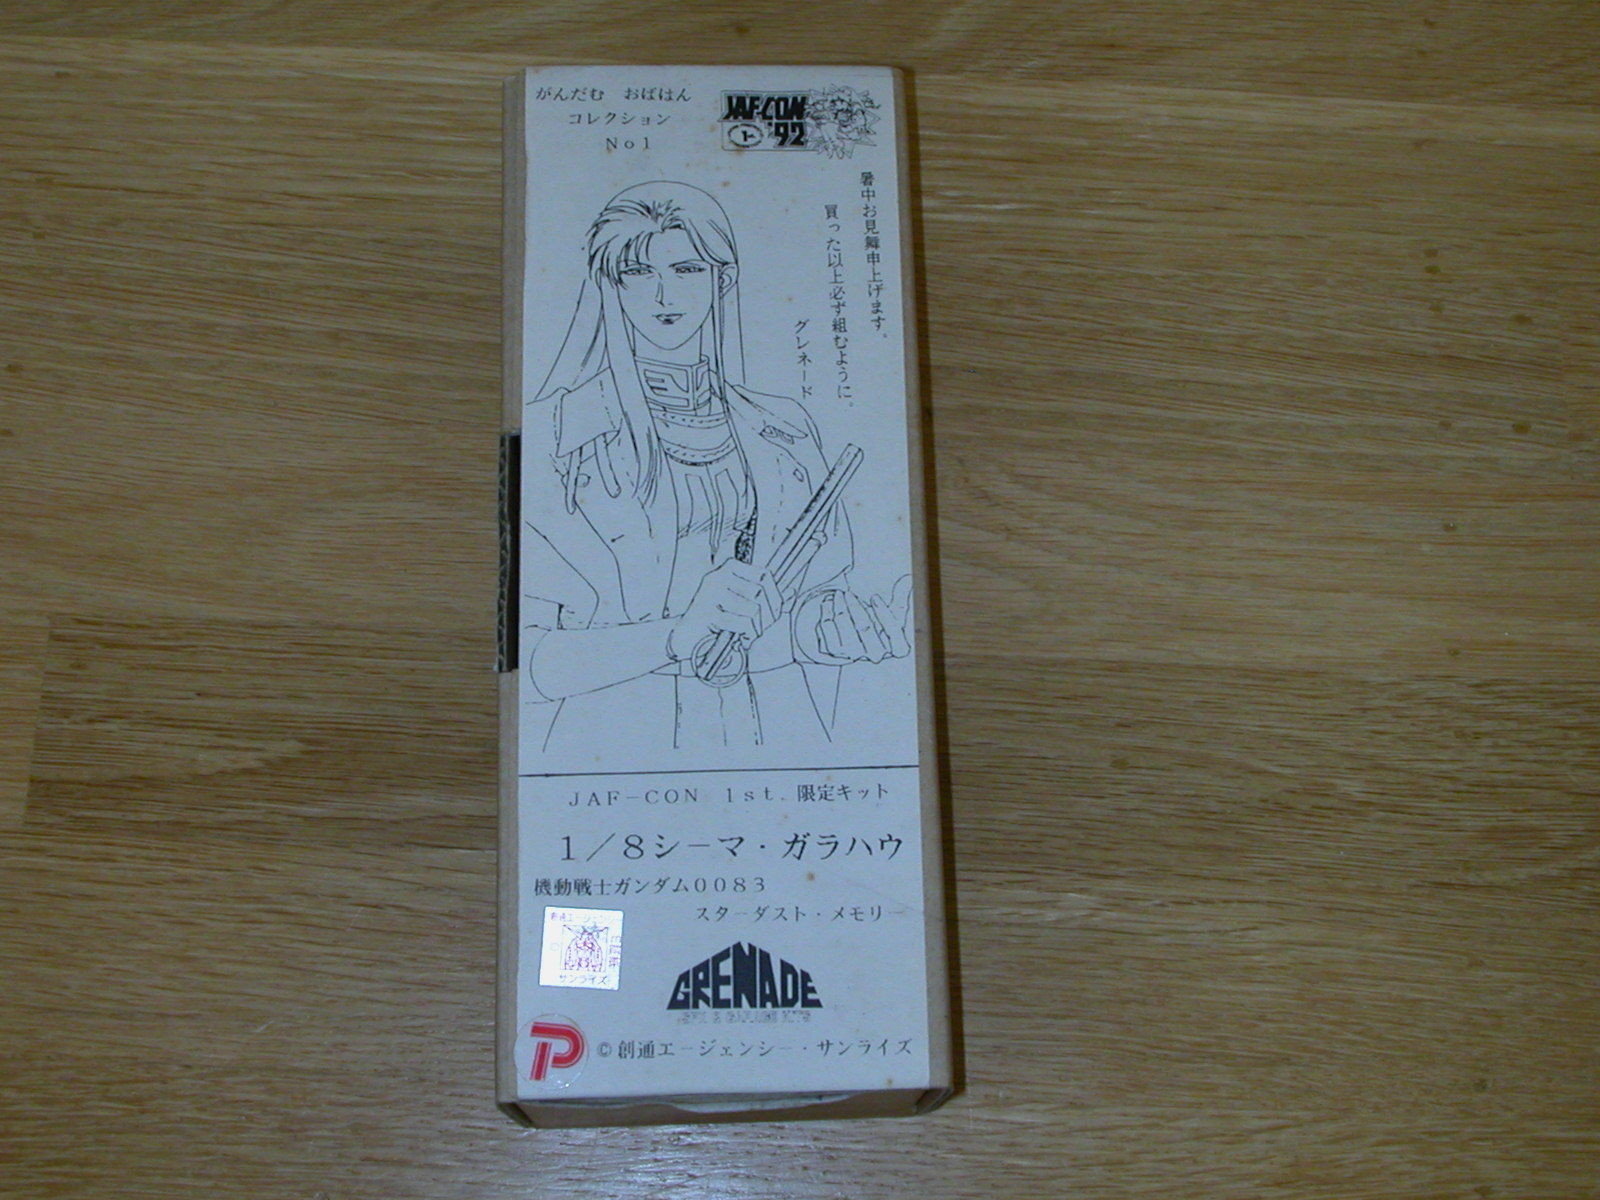 Last One  Cima Garahau 1 8 scale resin kit Jaf' Con 92 (Grenade) Gundam 0083